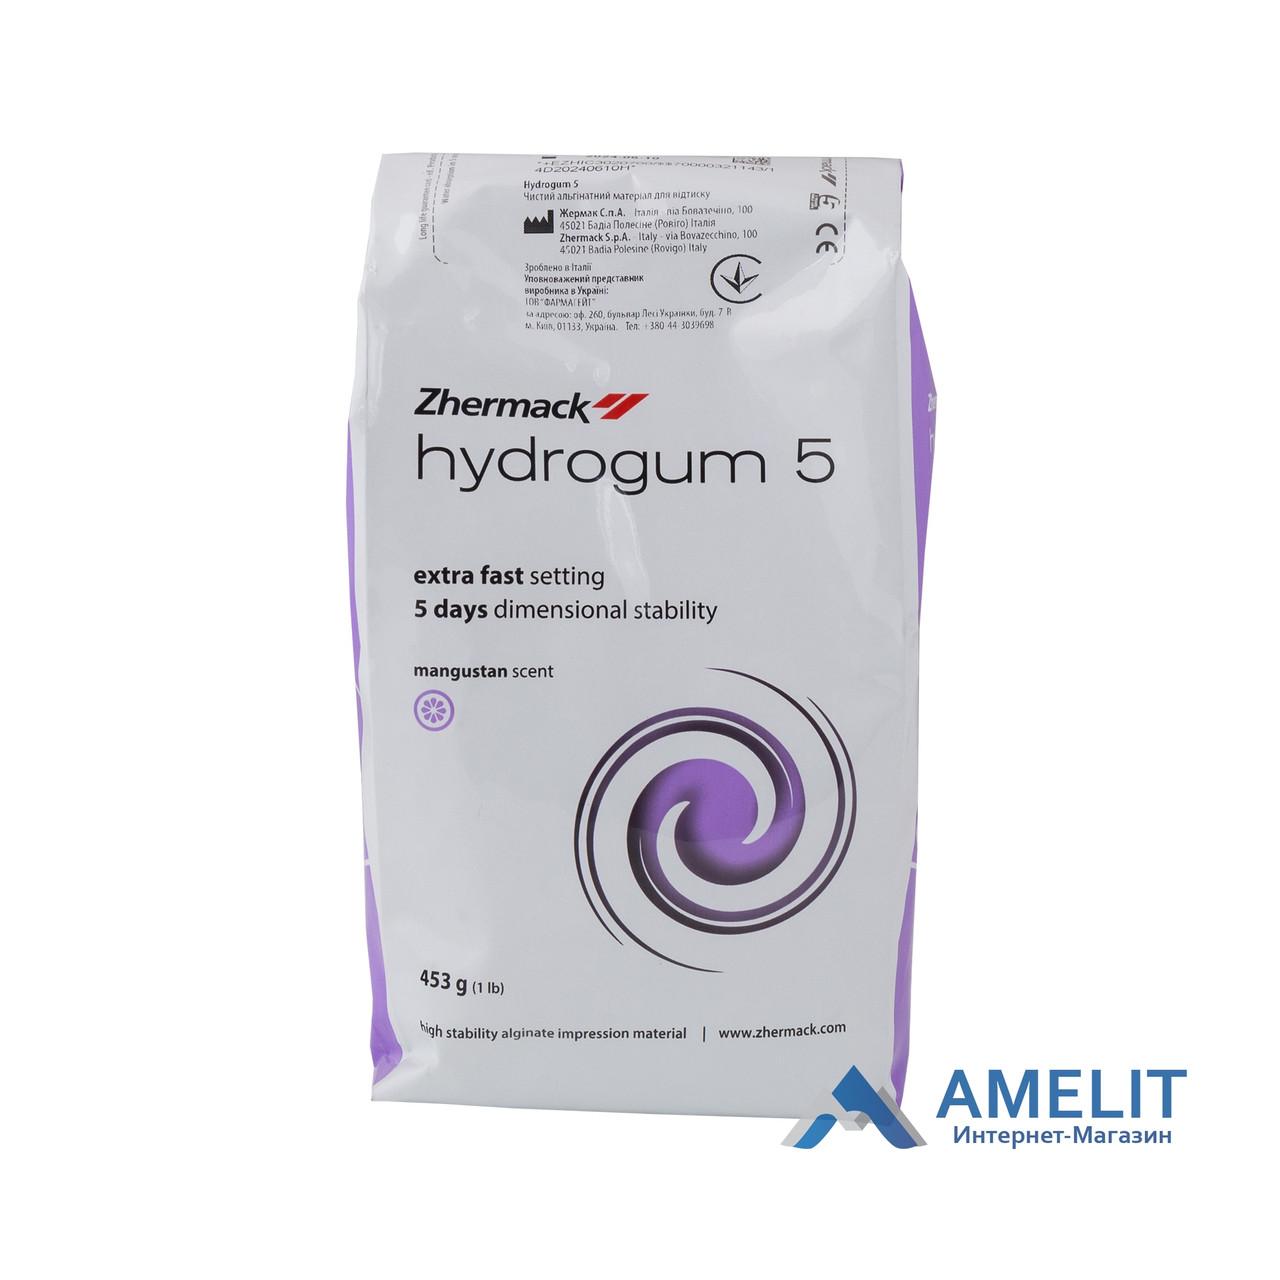 Гидрогум (Hydrogum 5, Zhermack), 453г